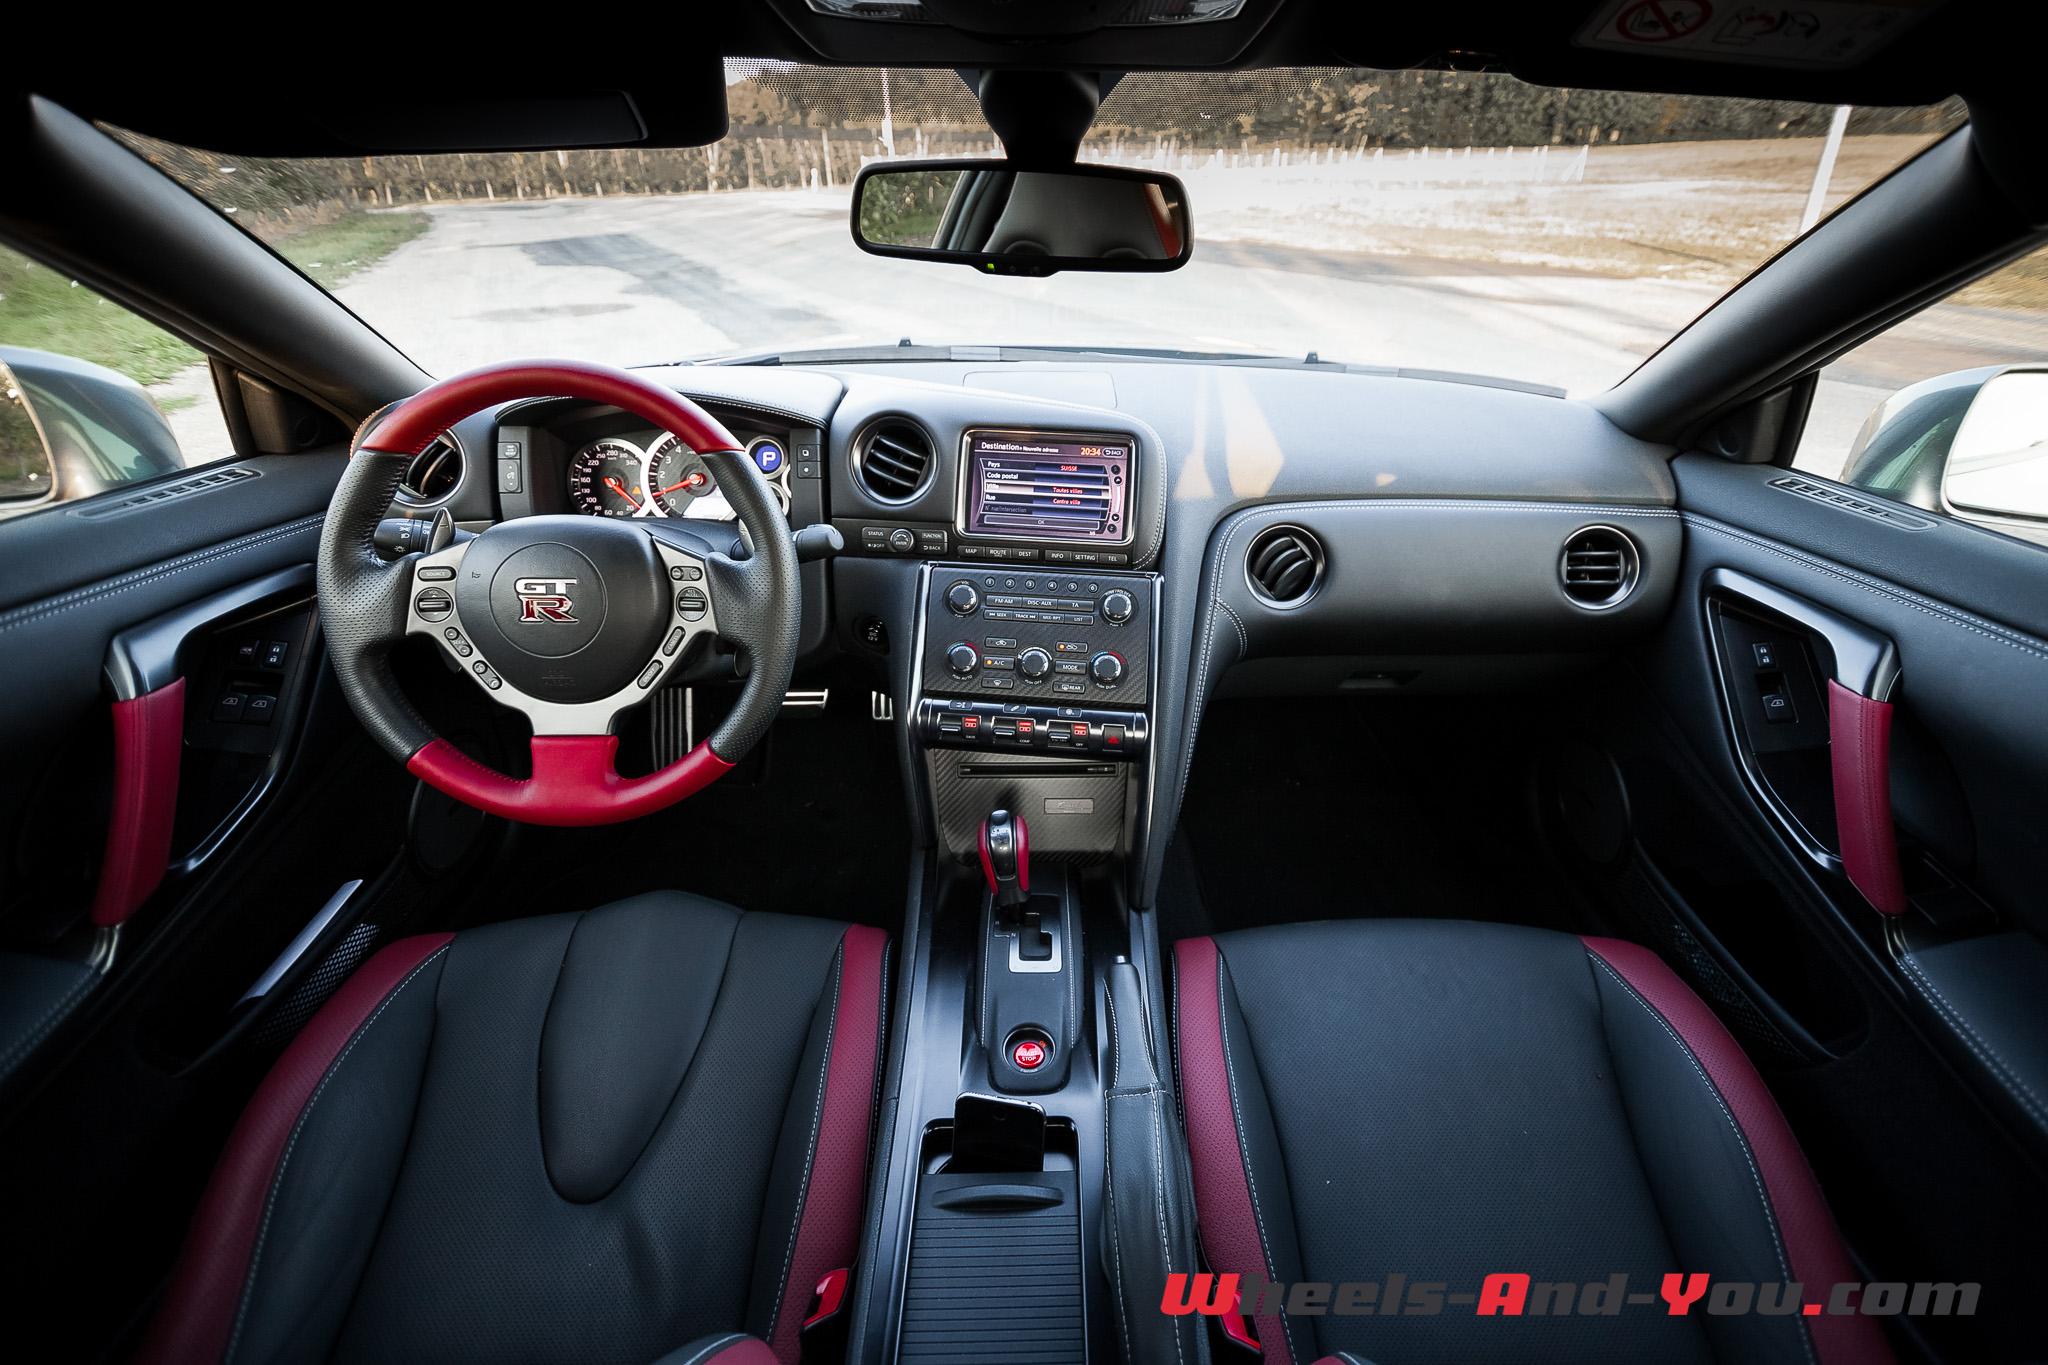 Nissan GTR 11